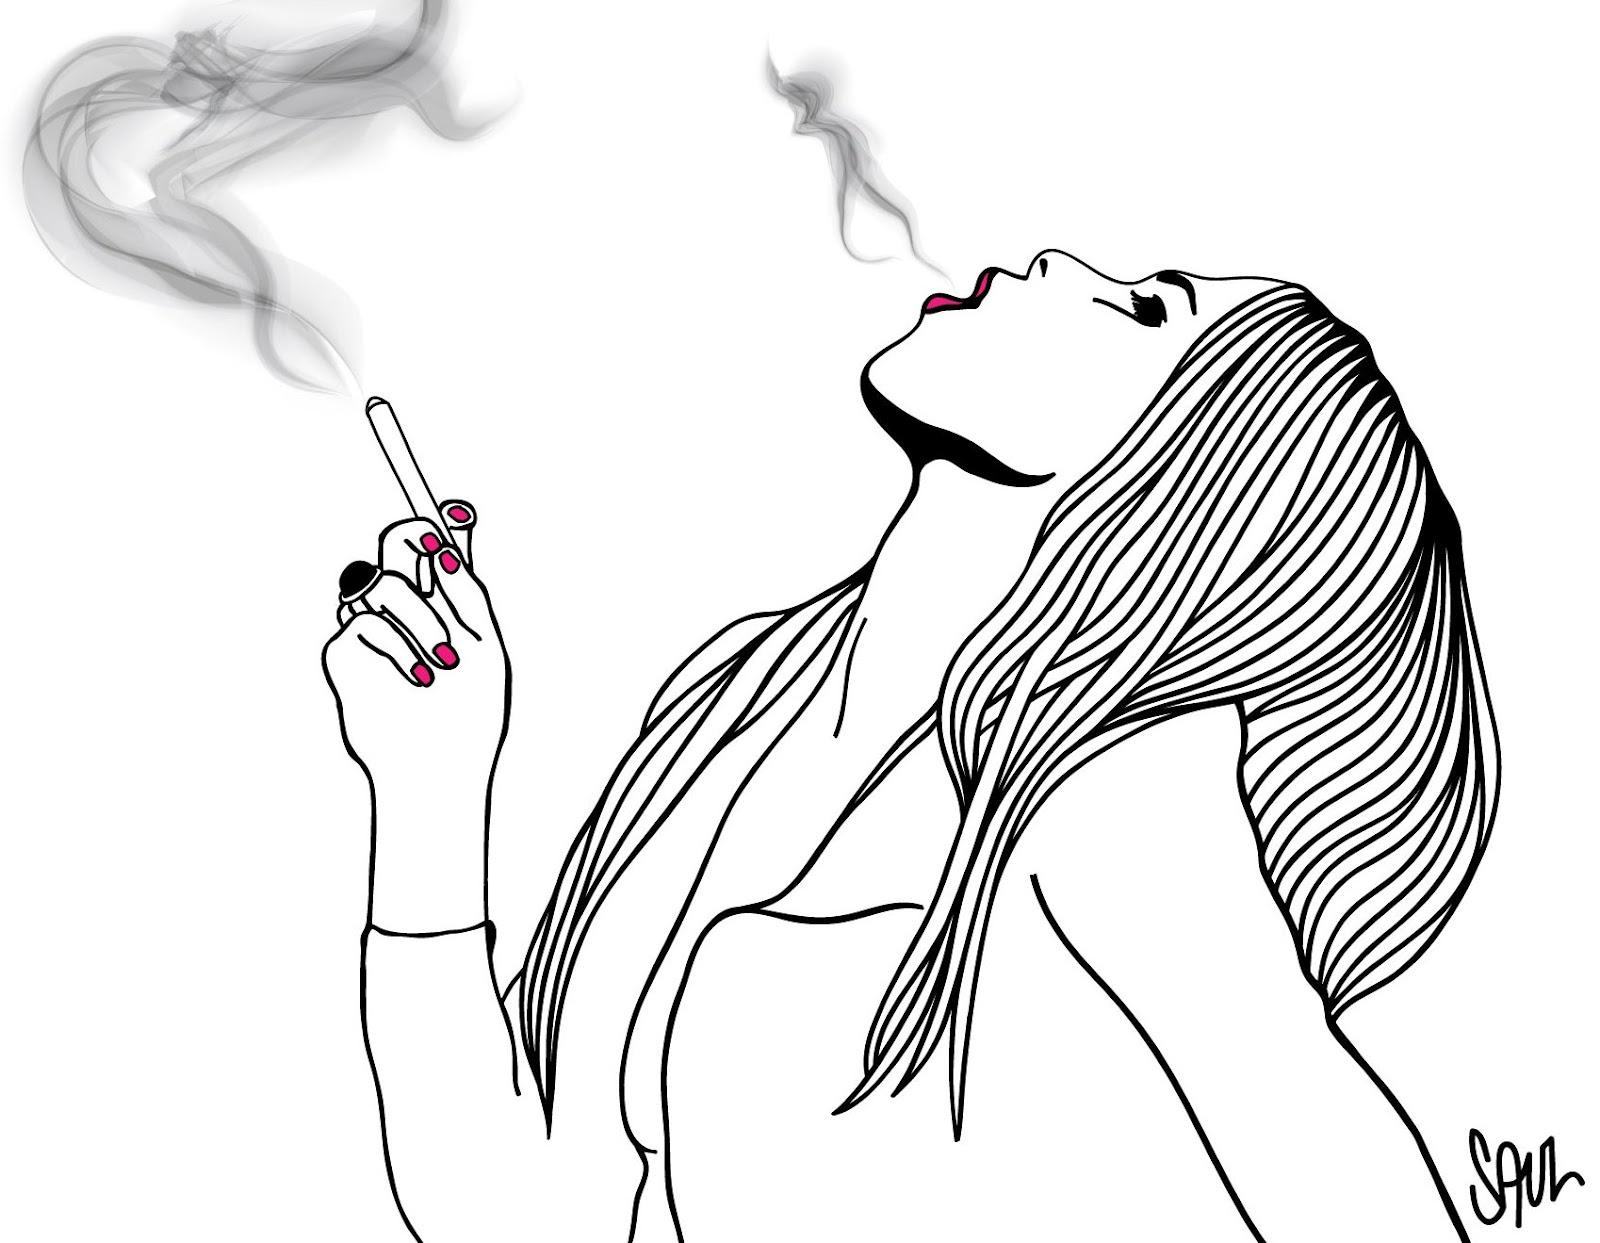 Девушки с сигаретами рисунок